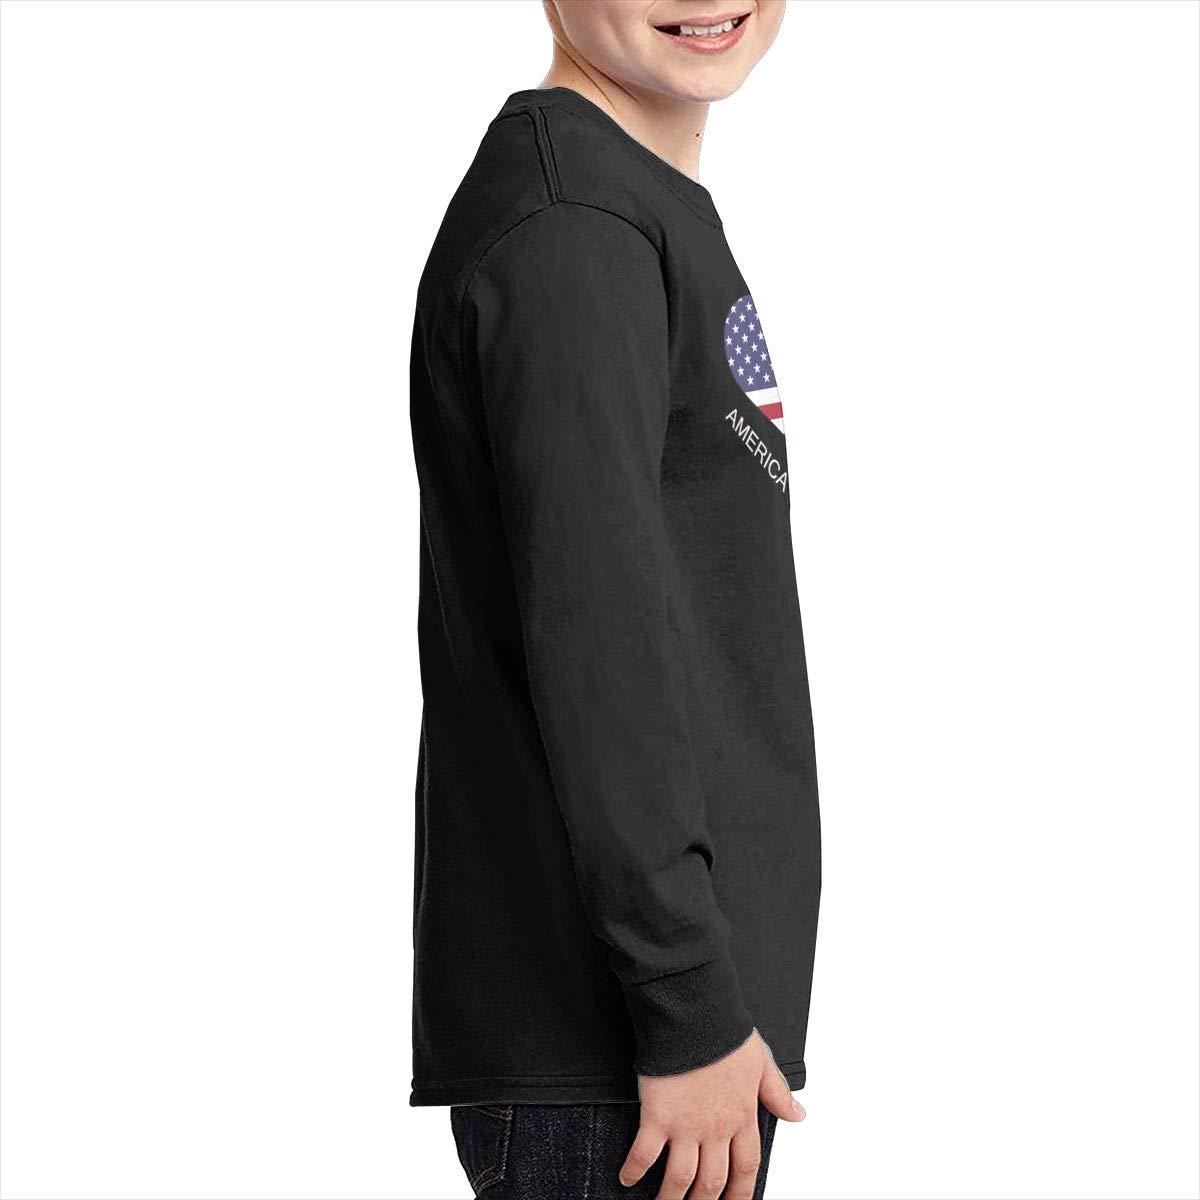 Teenagers Teen Girls America Iceland Flag Heart Printed Long Sleeve 100/% Cotton Tee Shirt